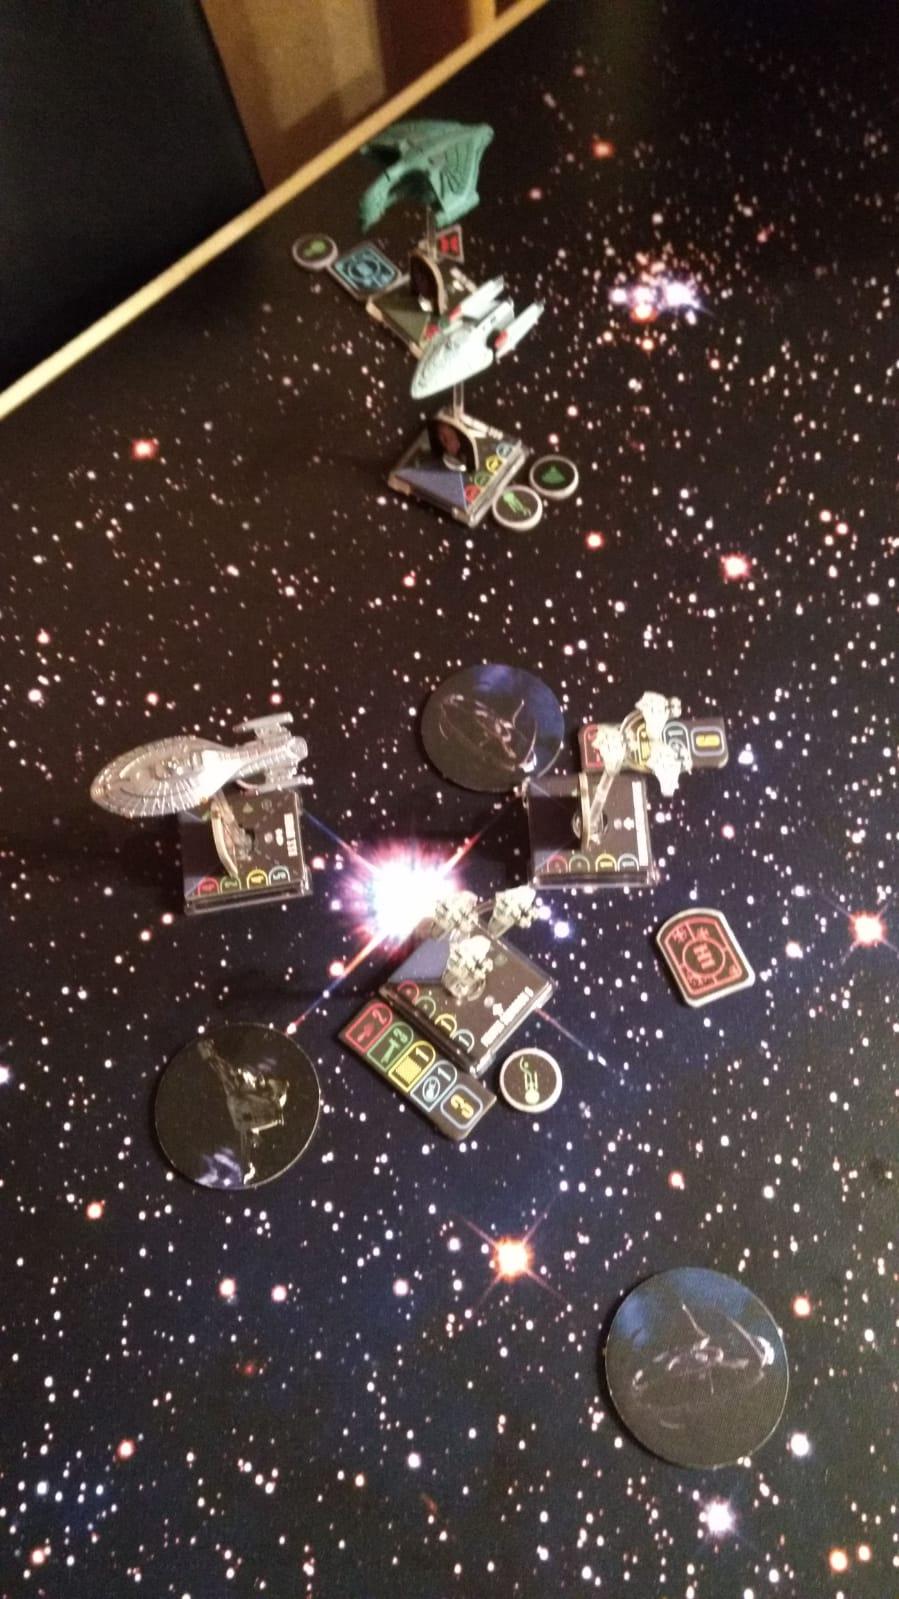 Kampf um Jouret [Föd. vs. Romulaner] Spiel910